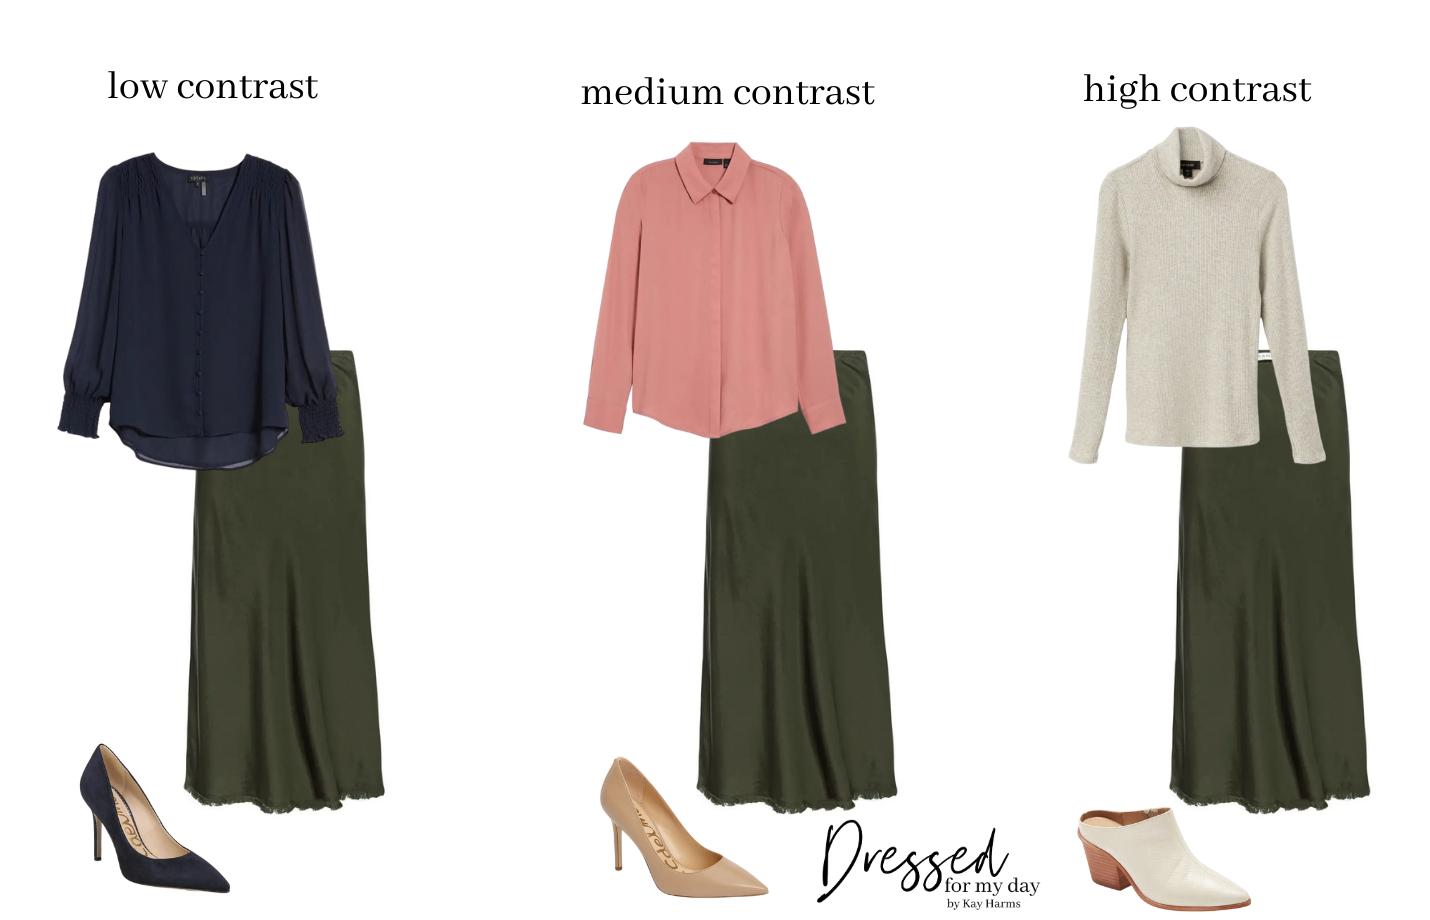 skirt contrast